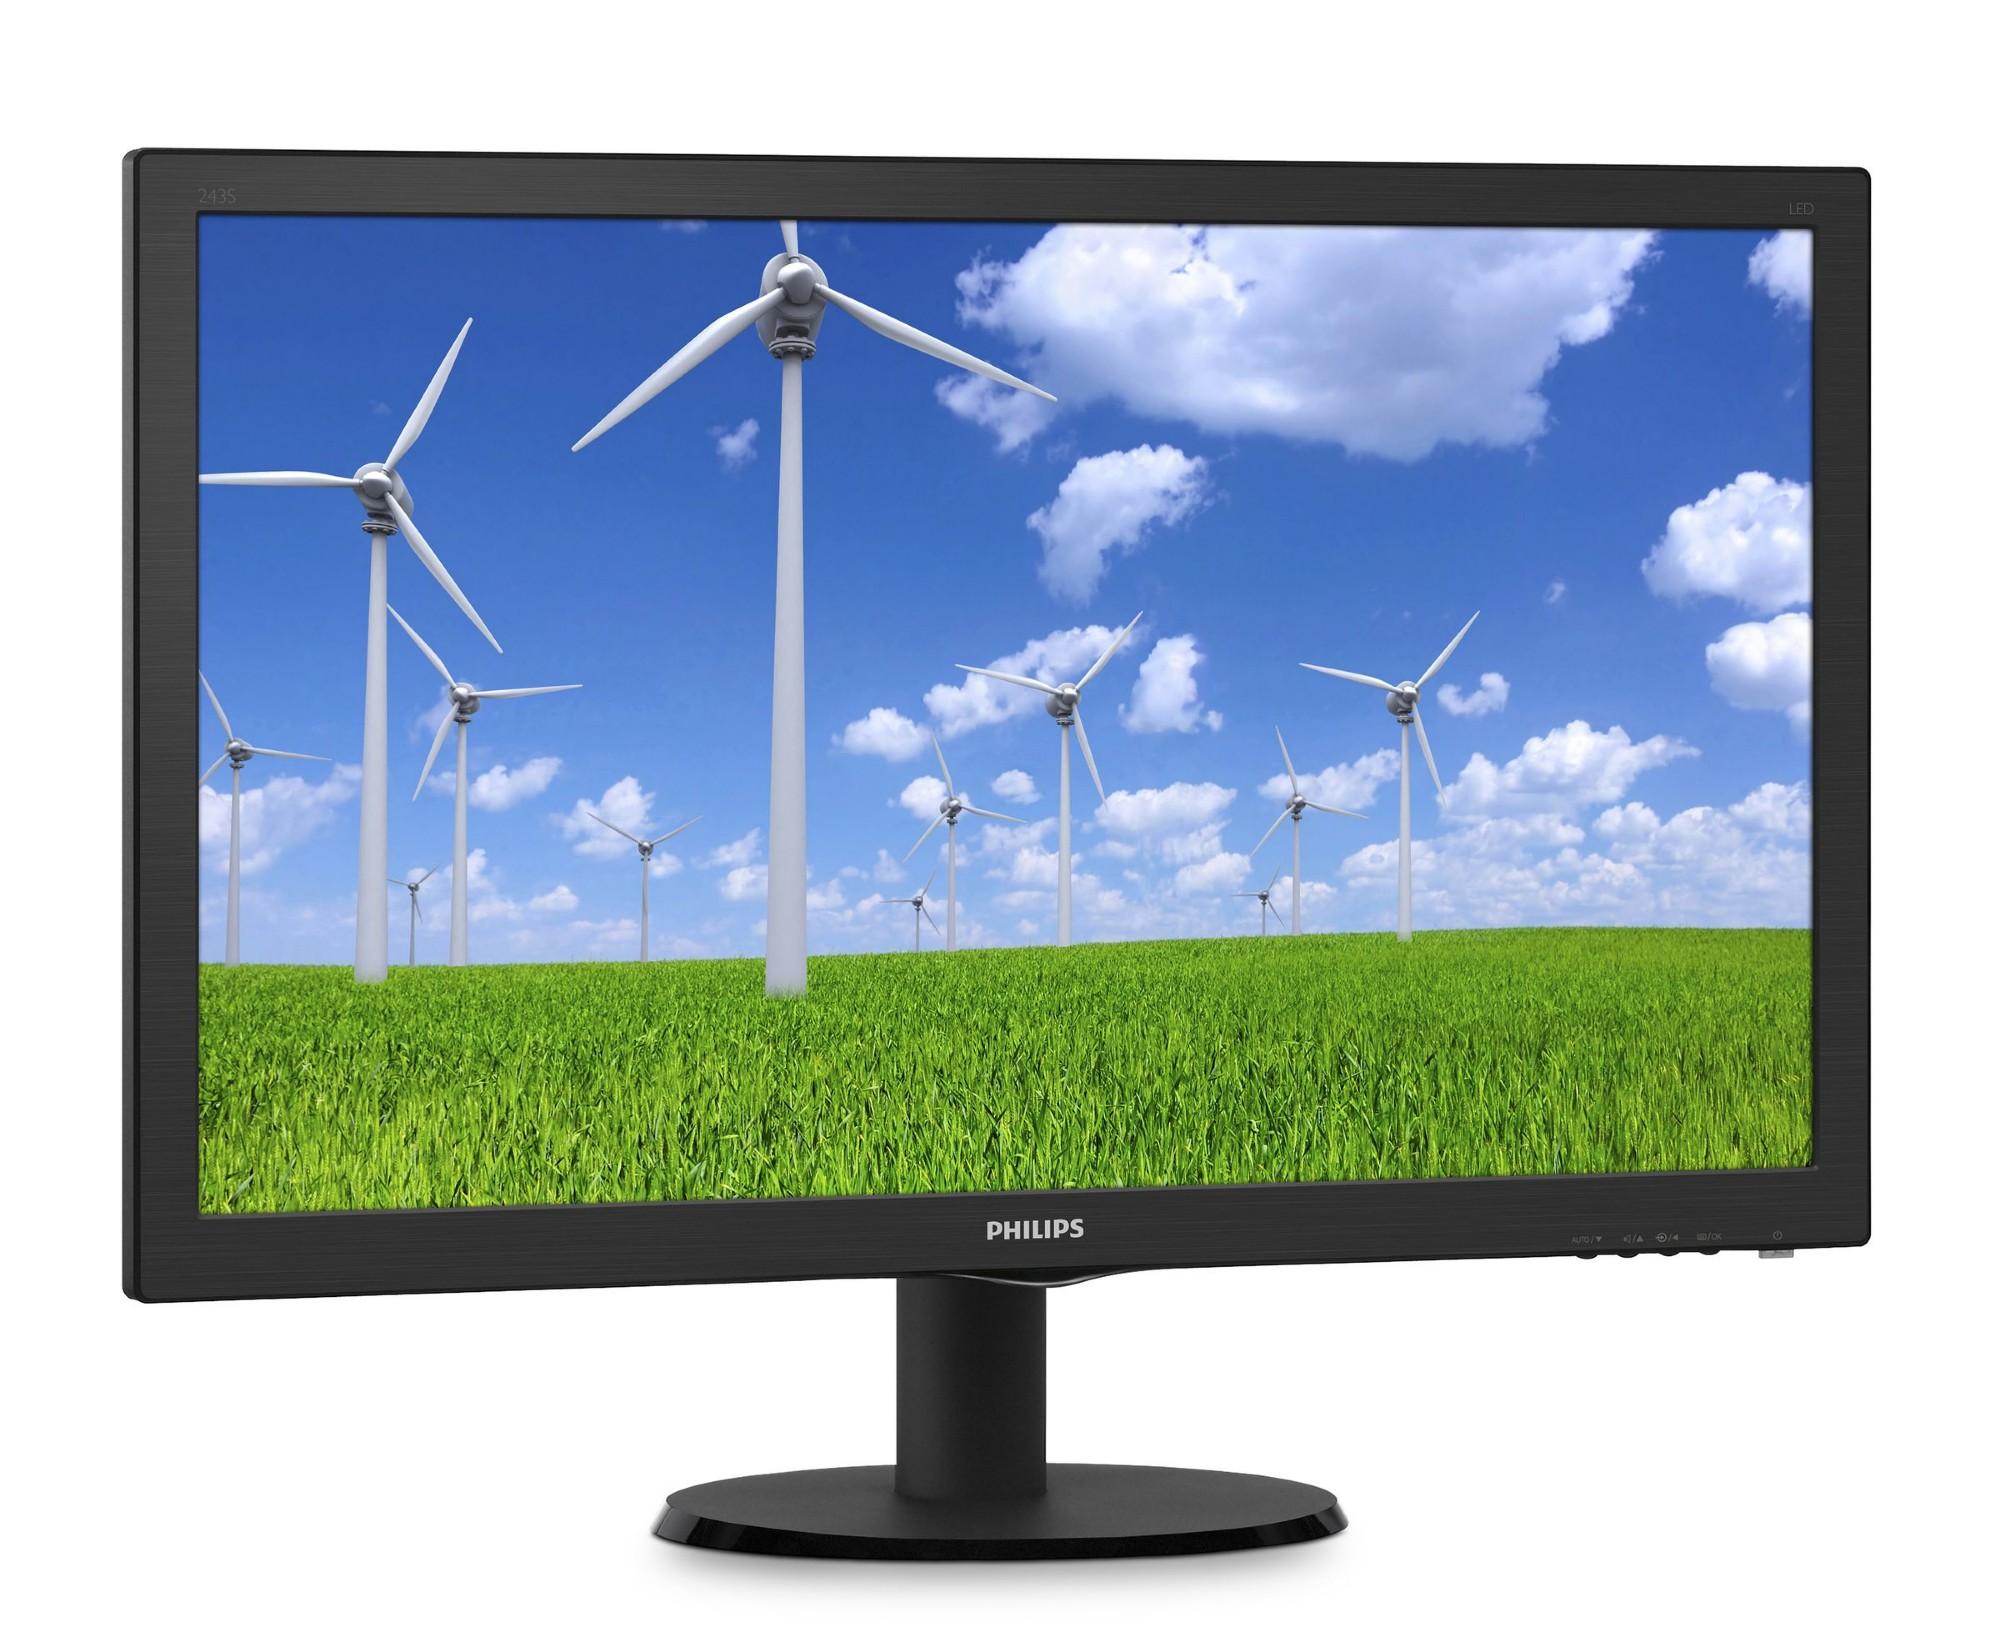 Philips LCD monitor 243S5LDAB/00